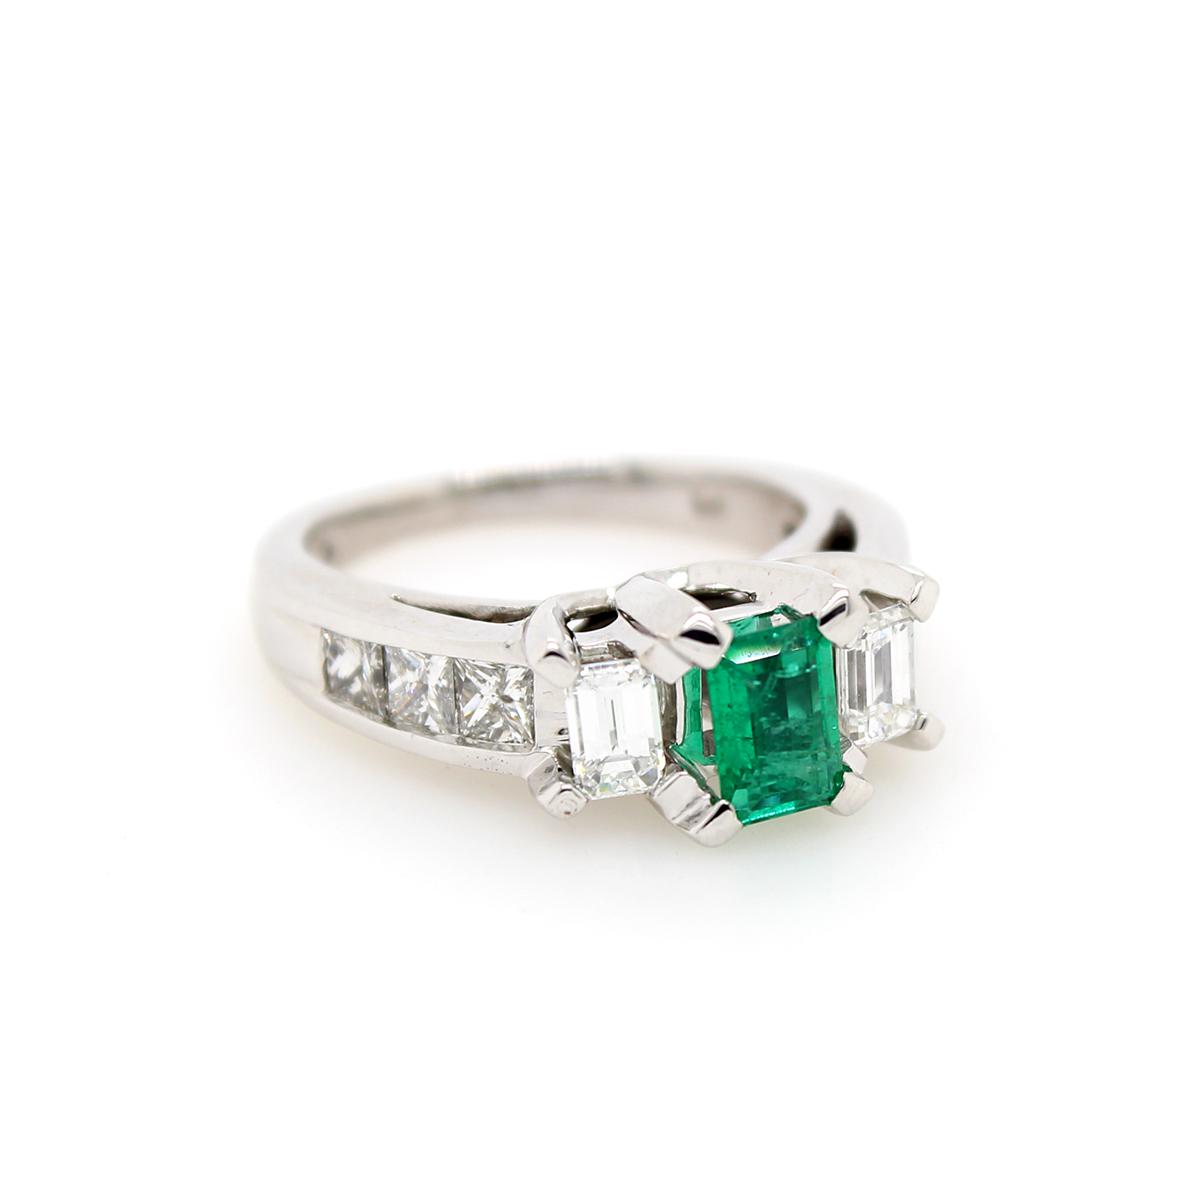 Vintage 14 Karat White Gold Emerald and Diamond ring